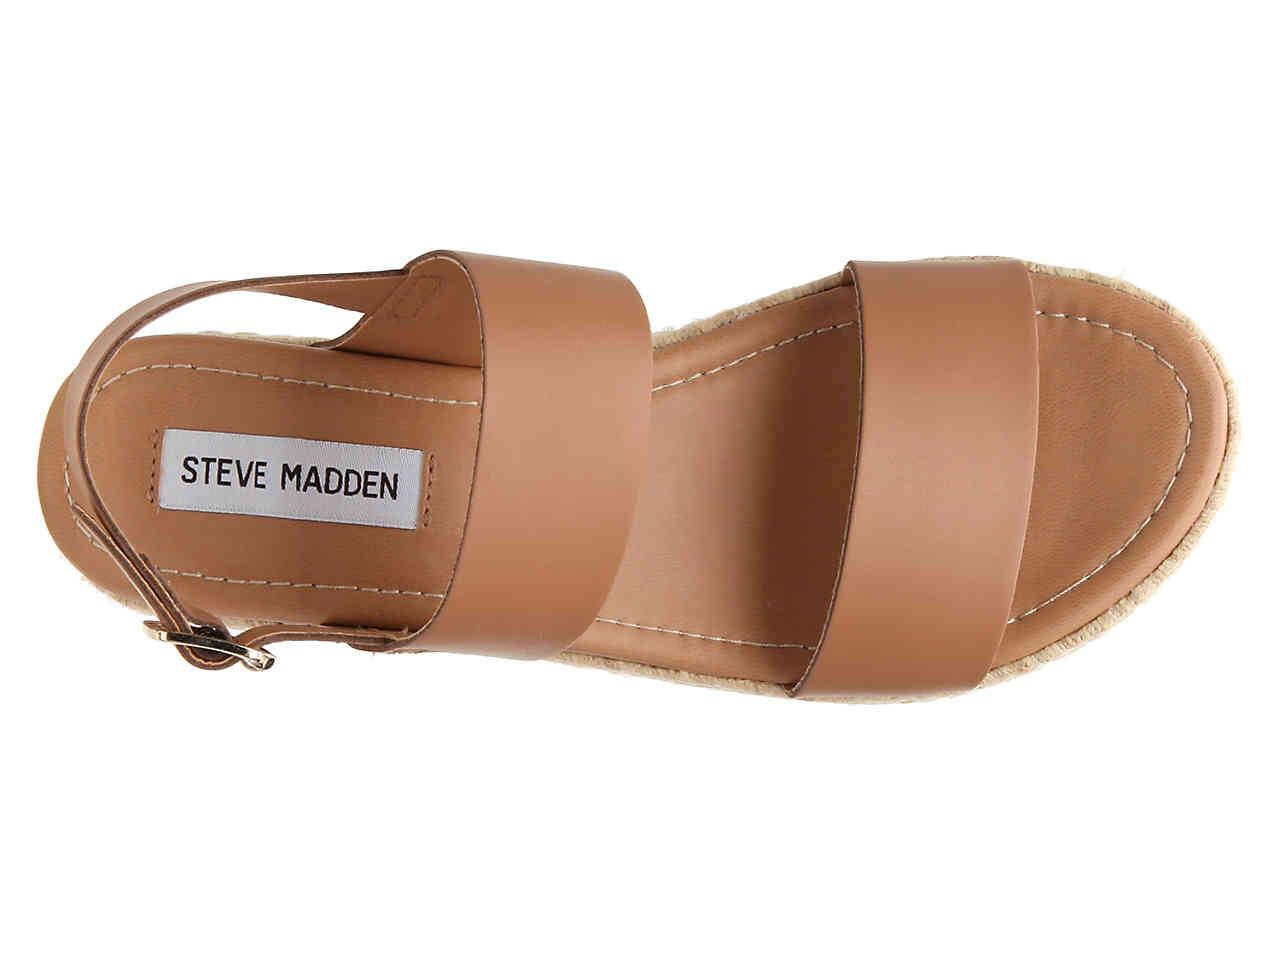 1f8e90eb9d Steve Madden Catia Espadrille Wedge Sandal in Natural - Lyst